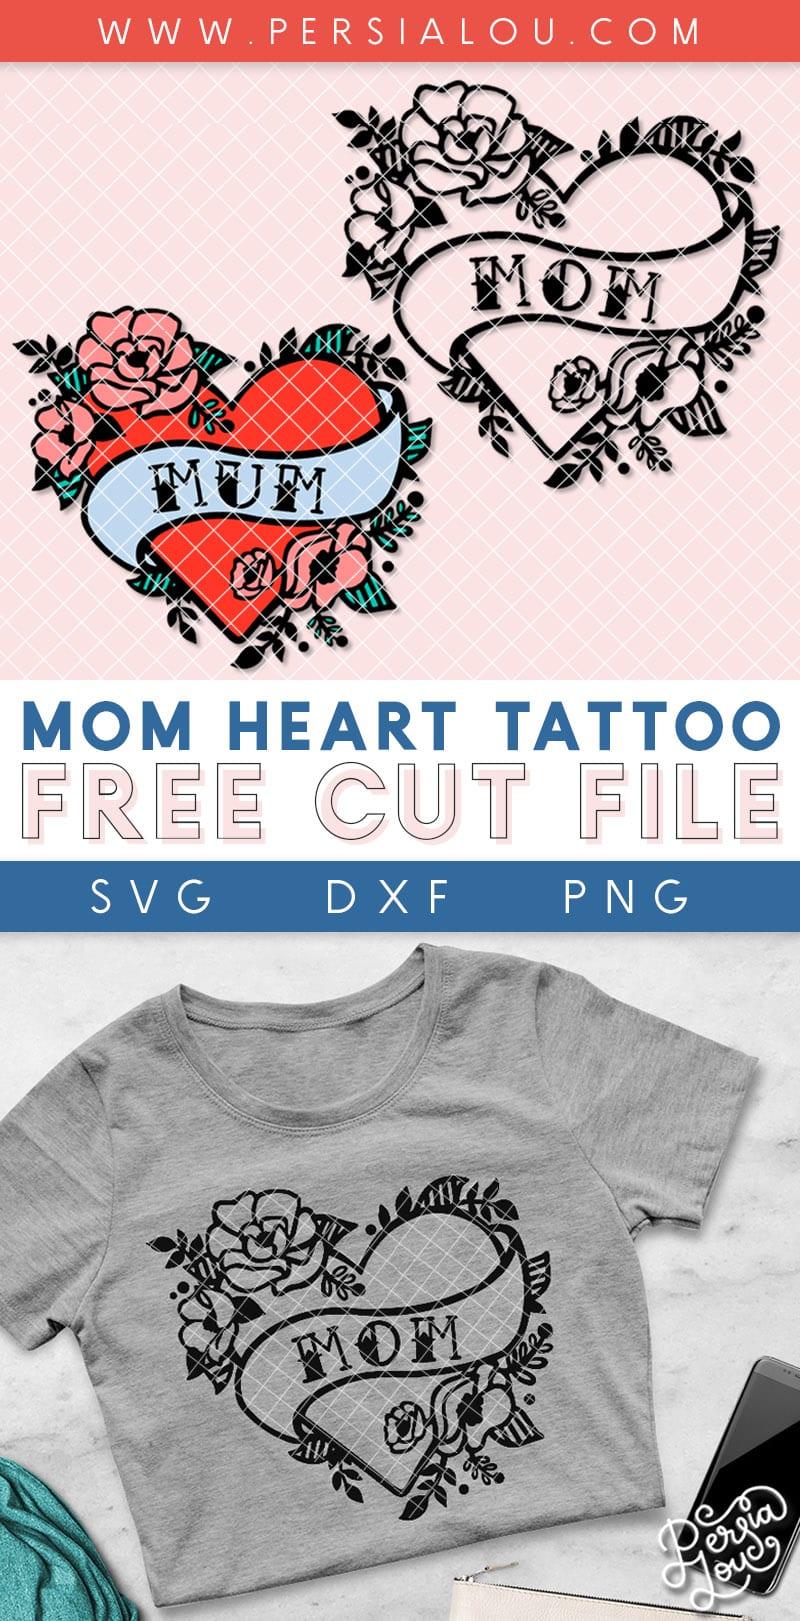 free mom or mum heart tattoo cut file